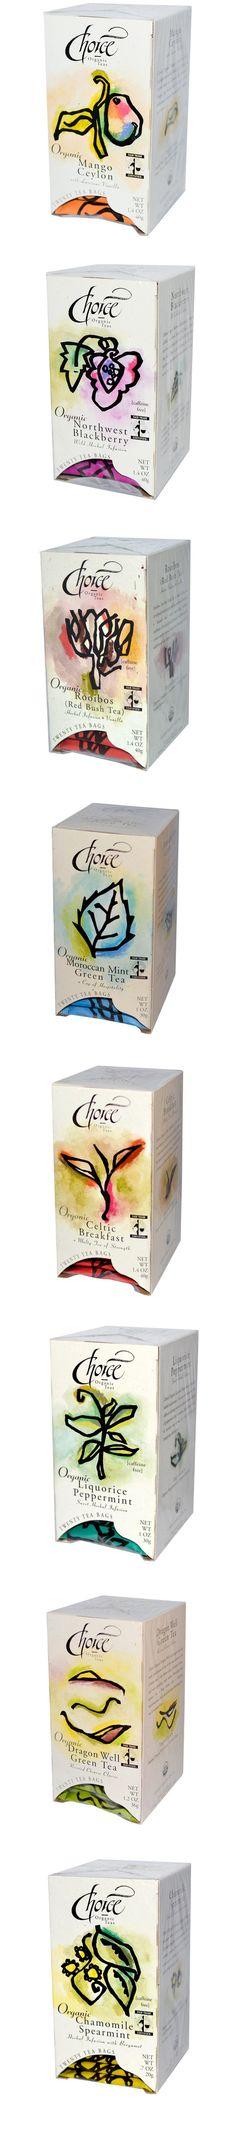 Choice Organic Tea | http://www.choiceorganicteas.com/